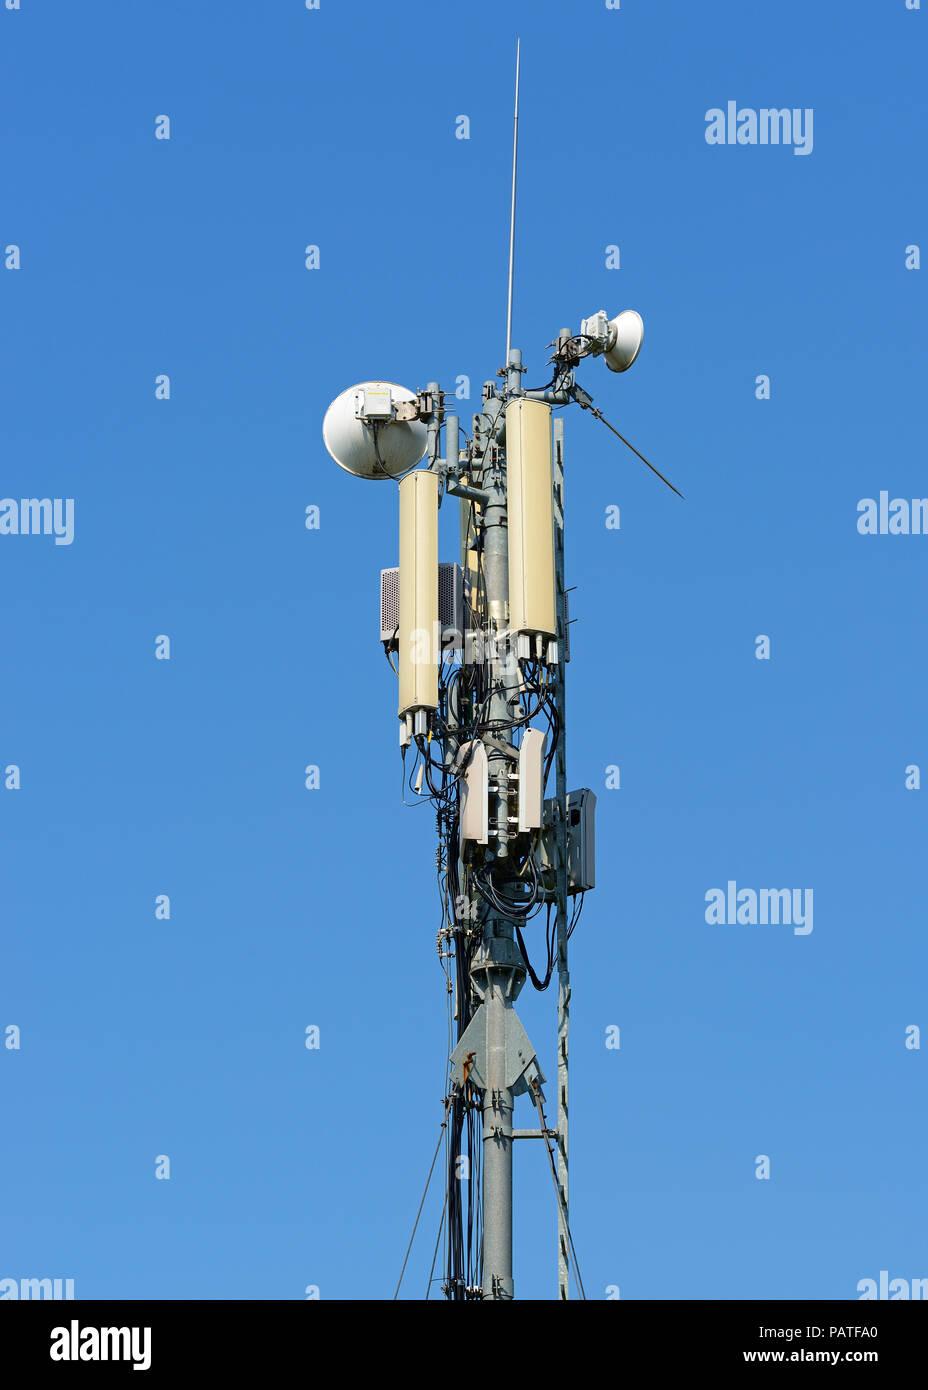 Mobile Phone Mast - Stock Image